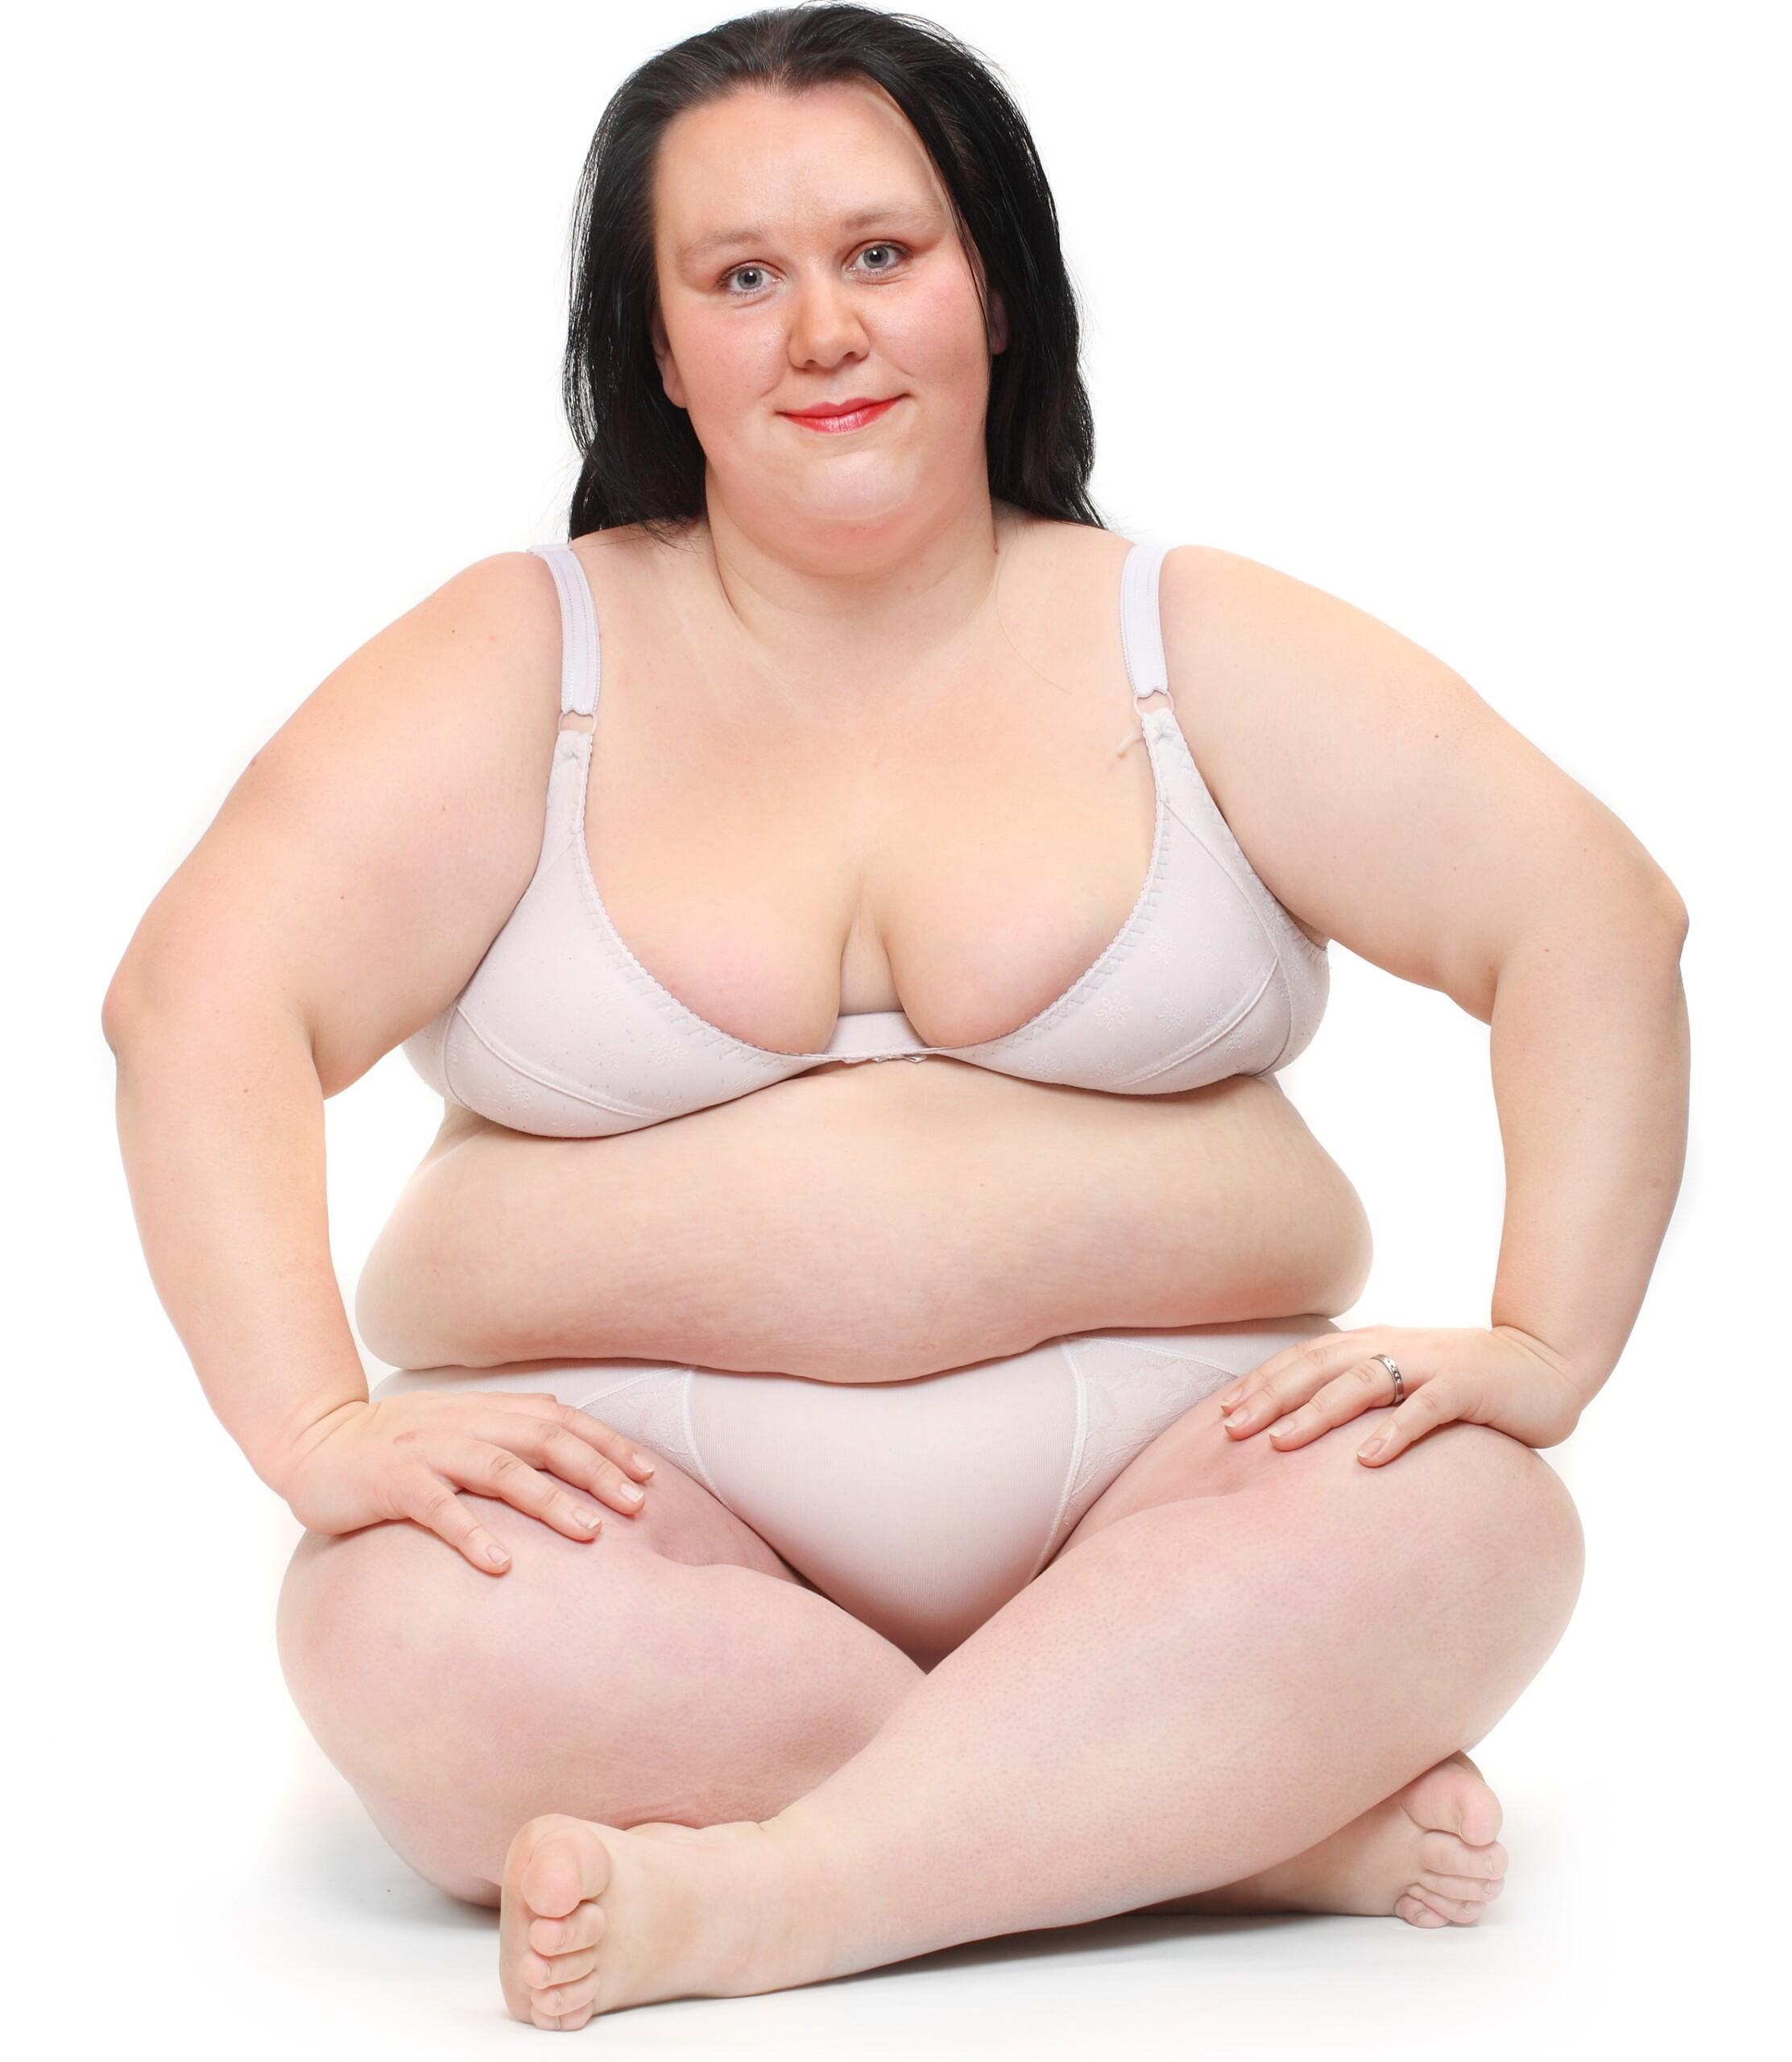 Morbidly Obese COVID Survivor Feels Fat Shamed by HospitalStaff